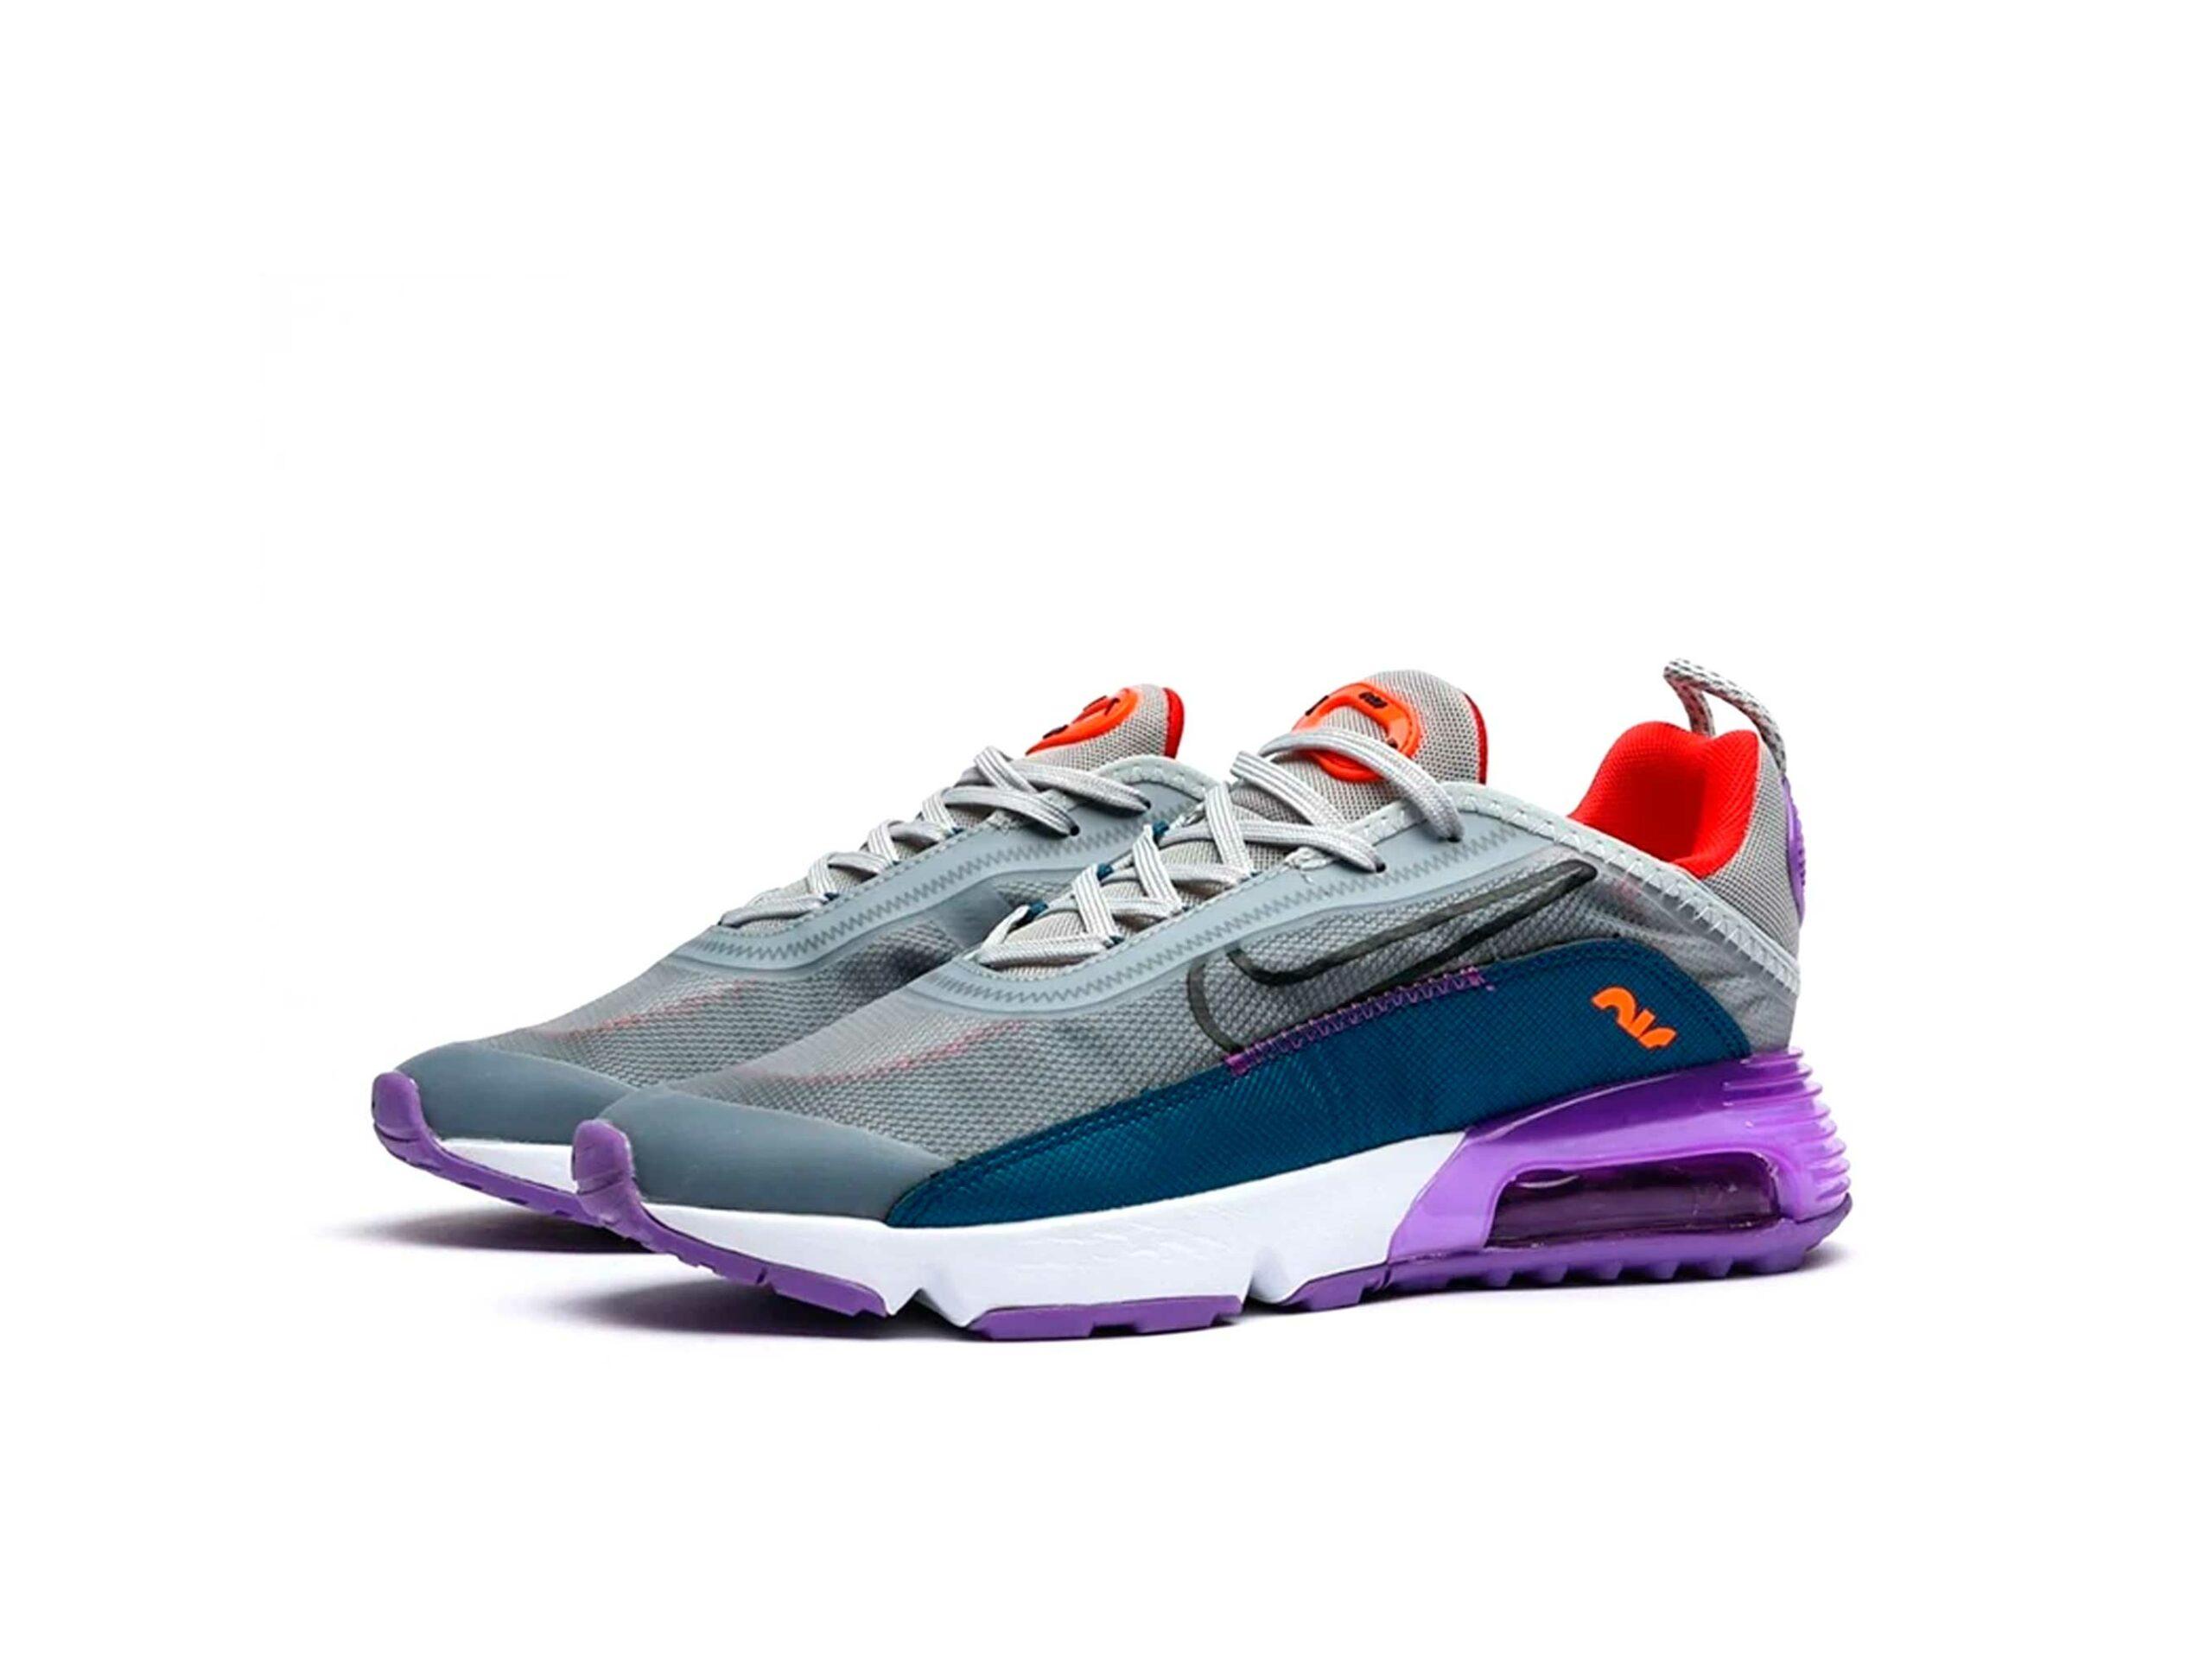 nike air max 2090 grey violet CT7698_003 купить